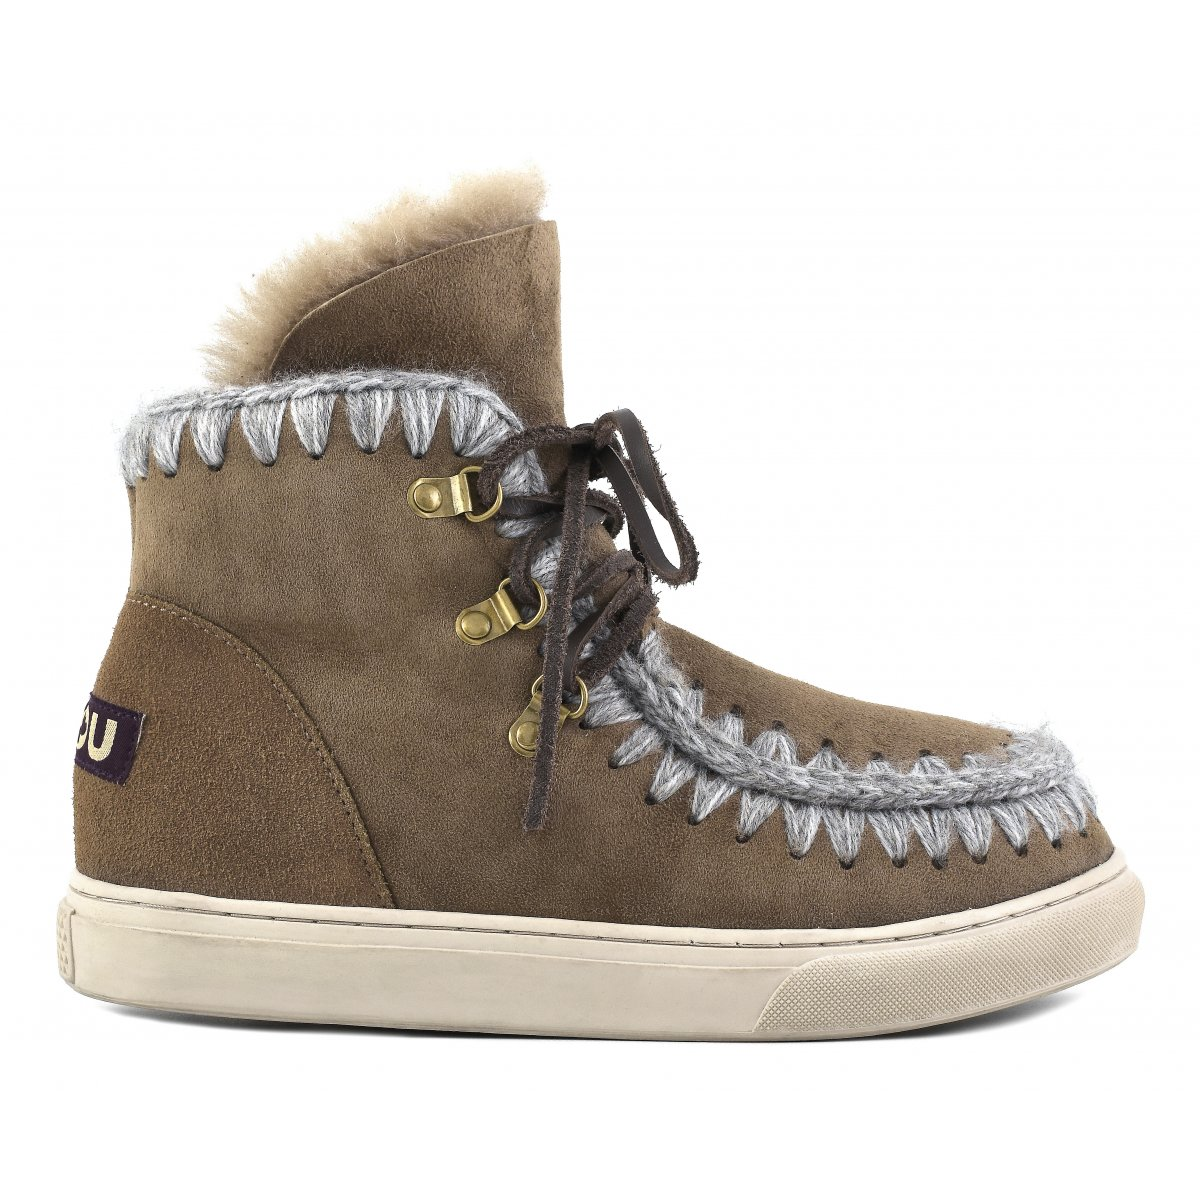 lace sneaker up mou fall winter sneakers women PkiuXZ